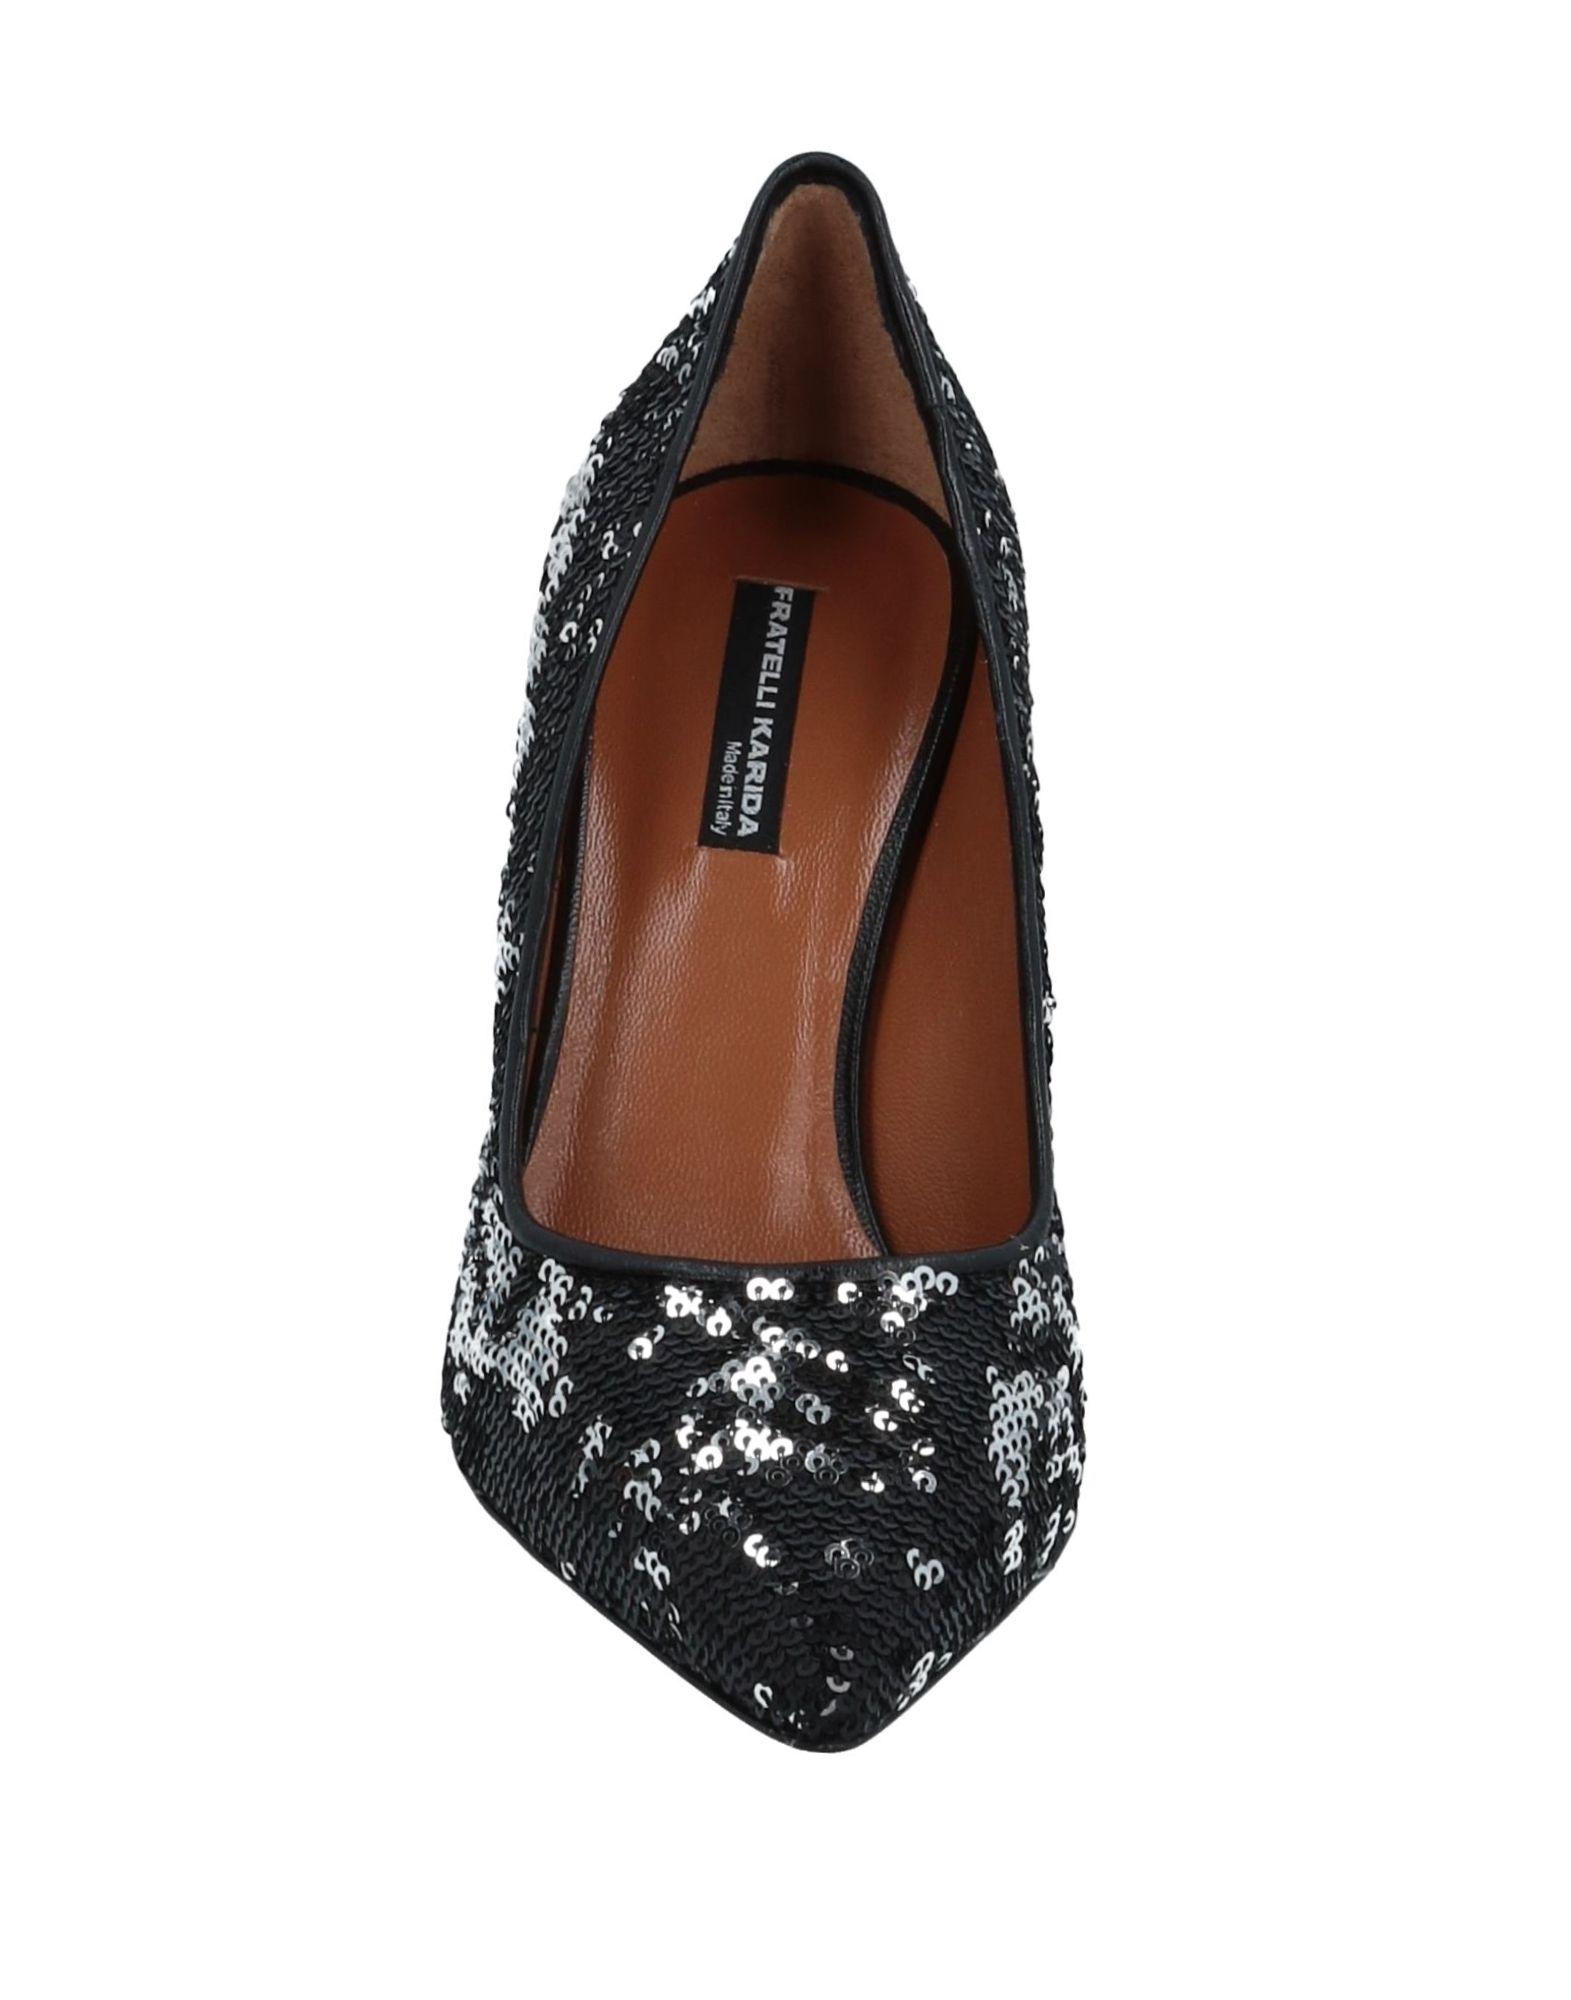 Fratelli Karida Pumps Damen Schuhe 11503013TD Gute Qualität beliebte Schuhe Damen 0ece19